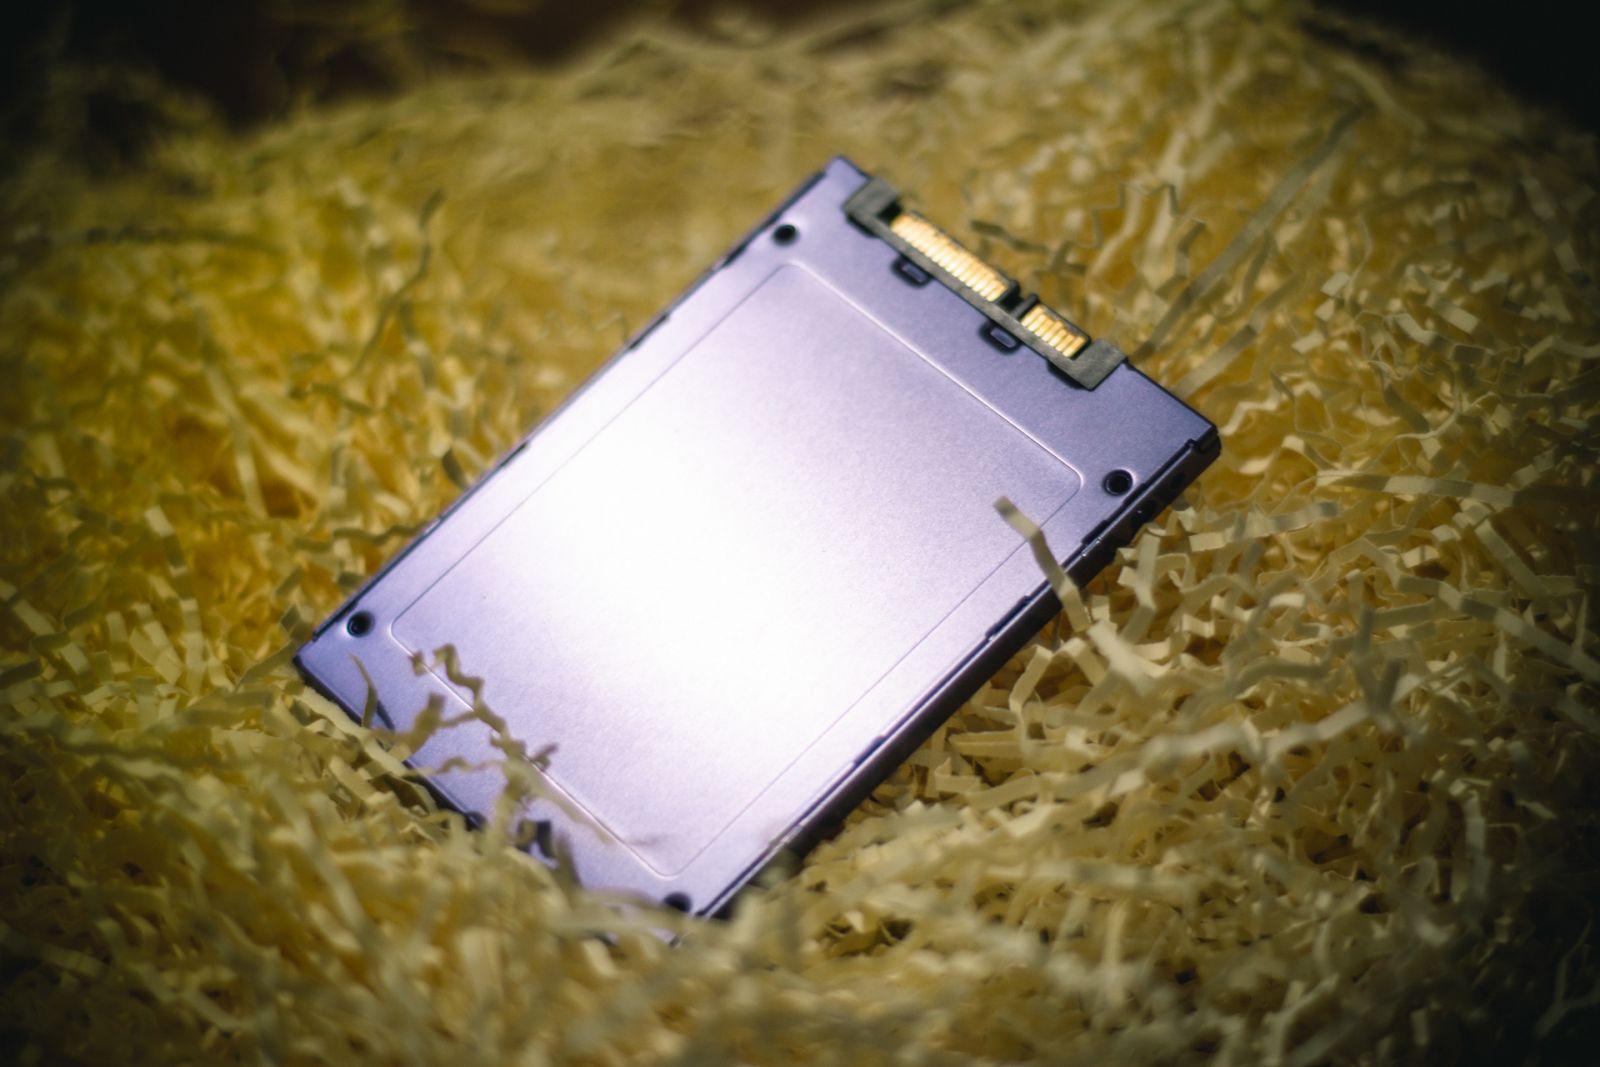 Быстро и надёжно. Обзор Silicon Power SSD Slim S55 (dsc 8736)